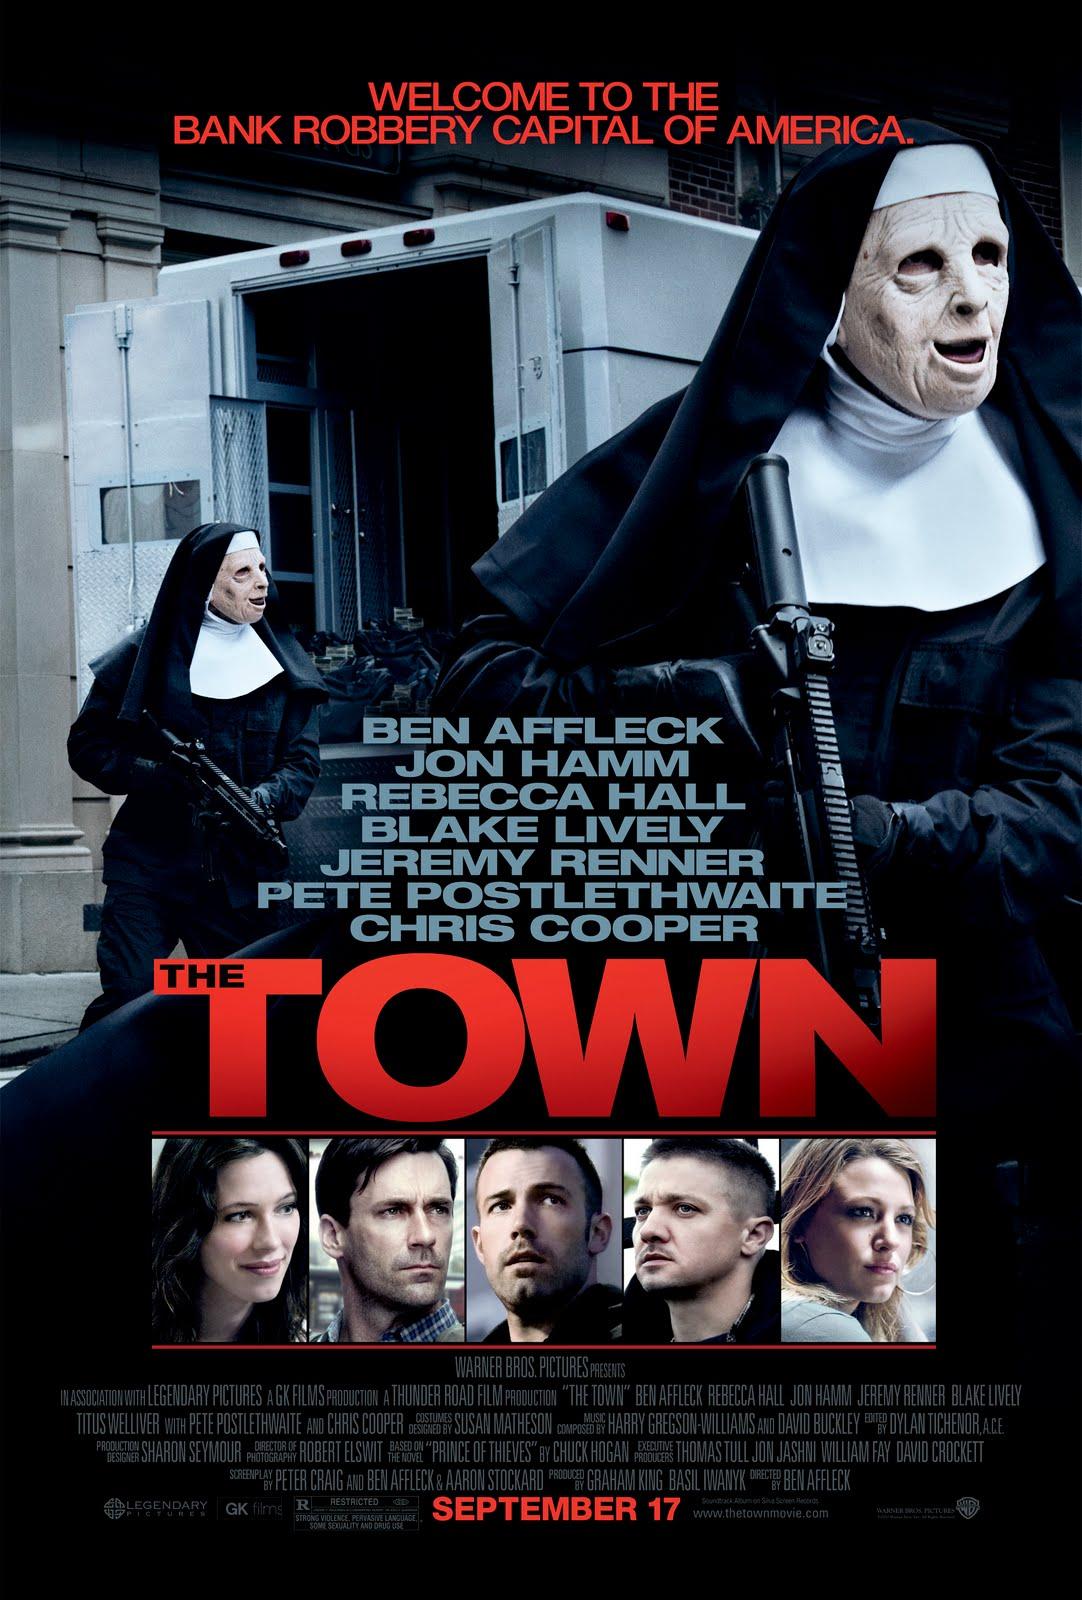 http://4.bp.blogspot.com/_gPzABHaAApg/TJOaN8cDMTI/AAAAAAAAGtI/2eUU6UYo2n0/s1600/the_town_movie_poster_01.jpg